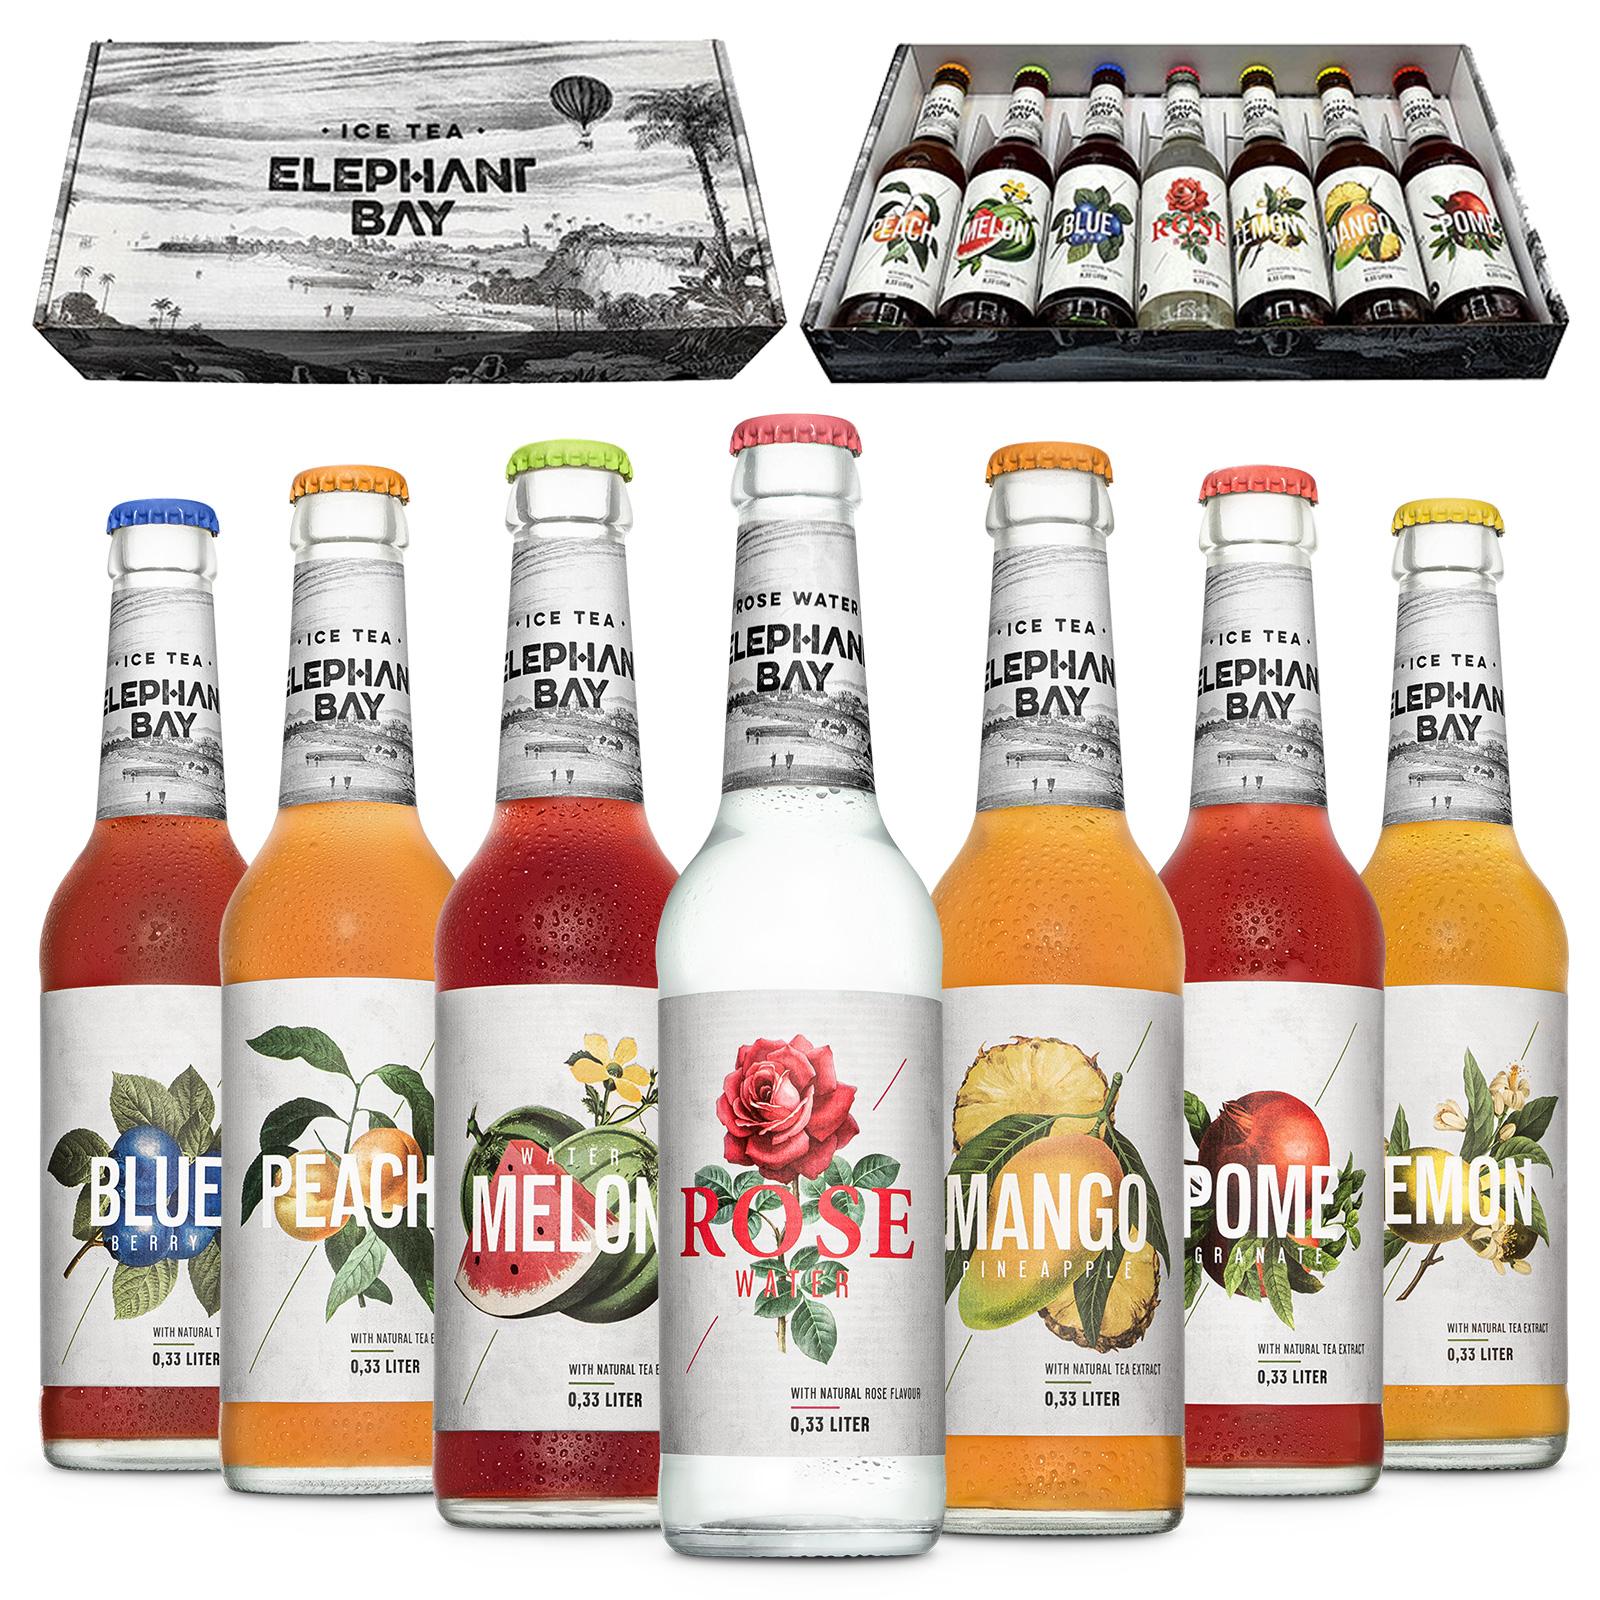 ICE TEA Eistee Elephant Bay - 7 Sorten Probier Set - Peach + Melon + Blueberry + Lemon + Mango + Pomegranate + Rose Water je 330ml